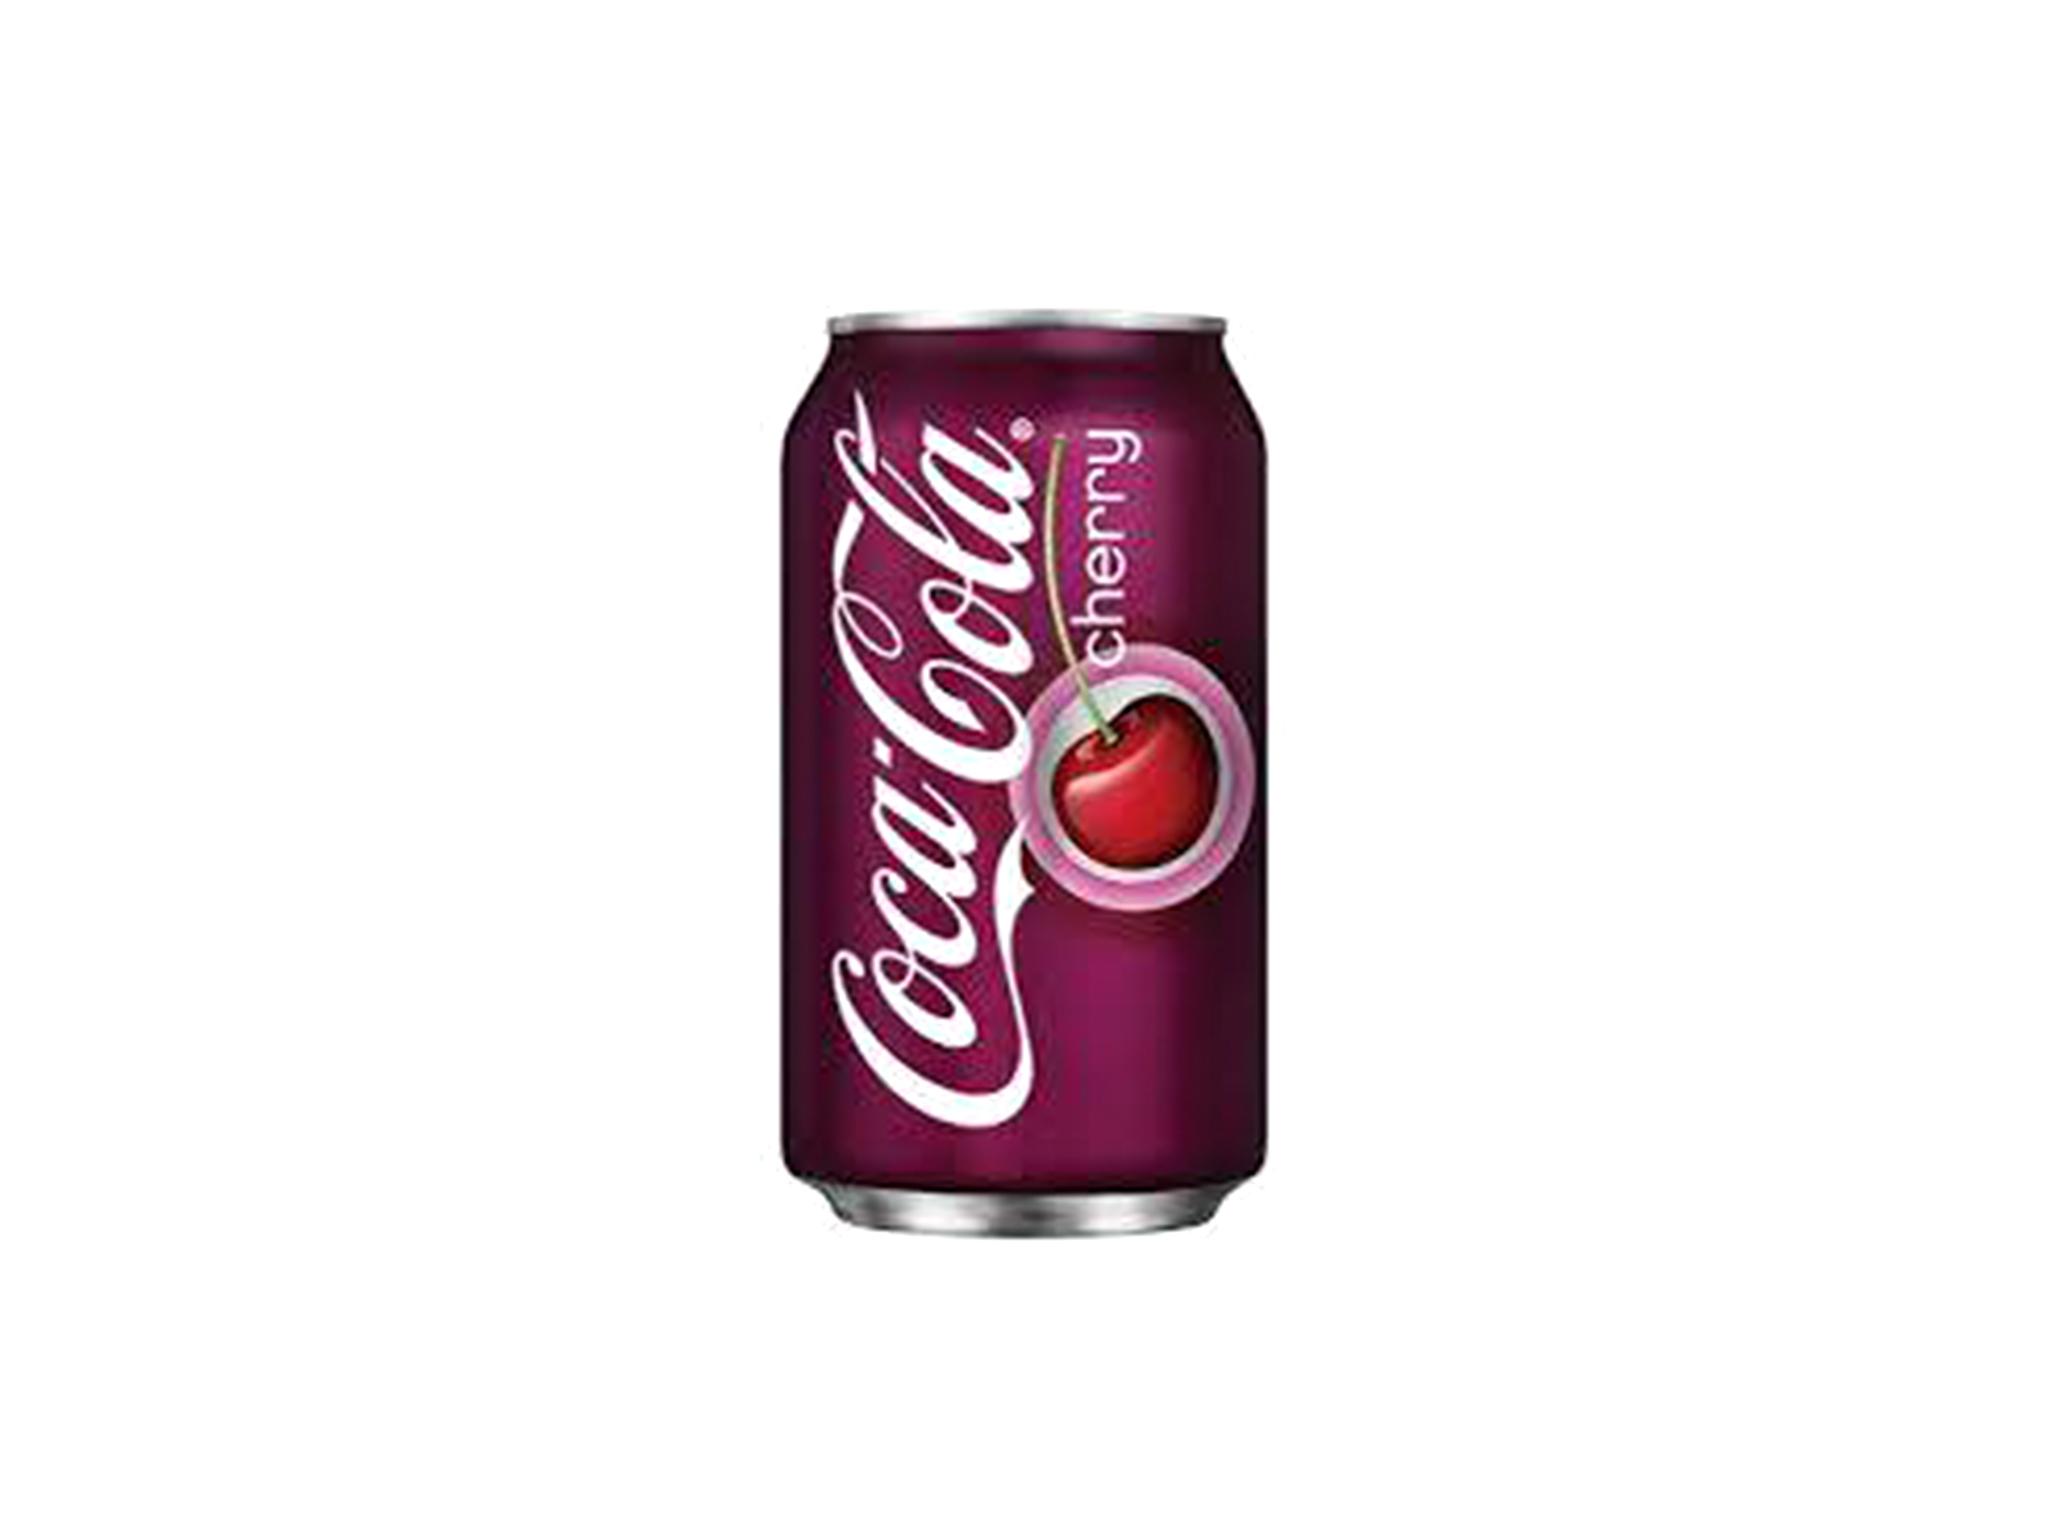 Compras, Mercearias, Liberty American Store, Coca-Cola Cherry